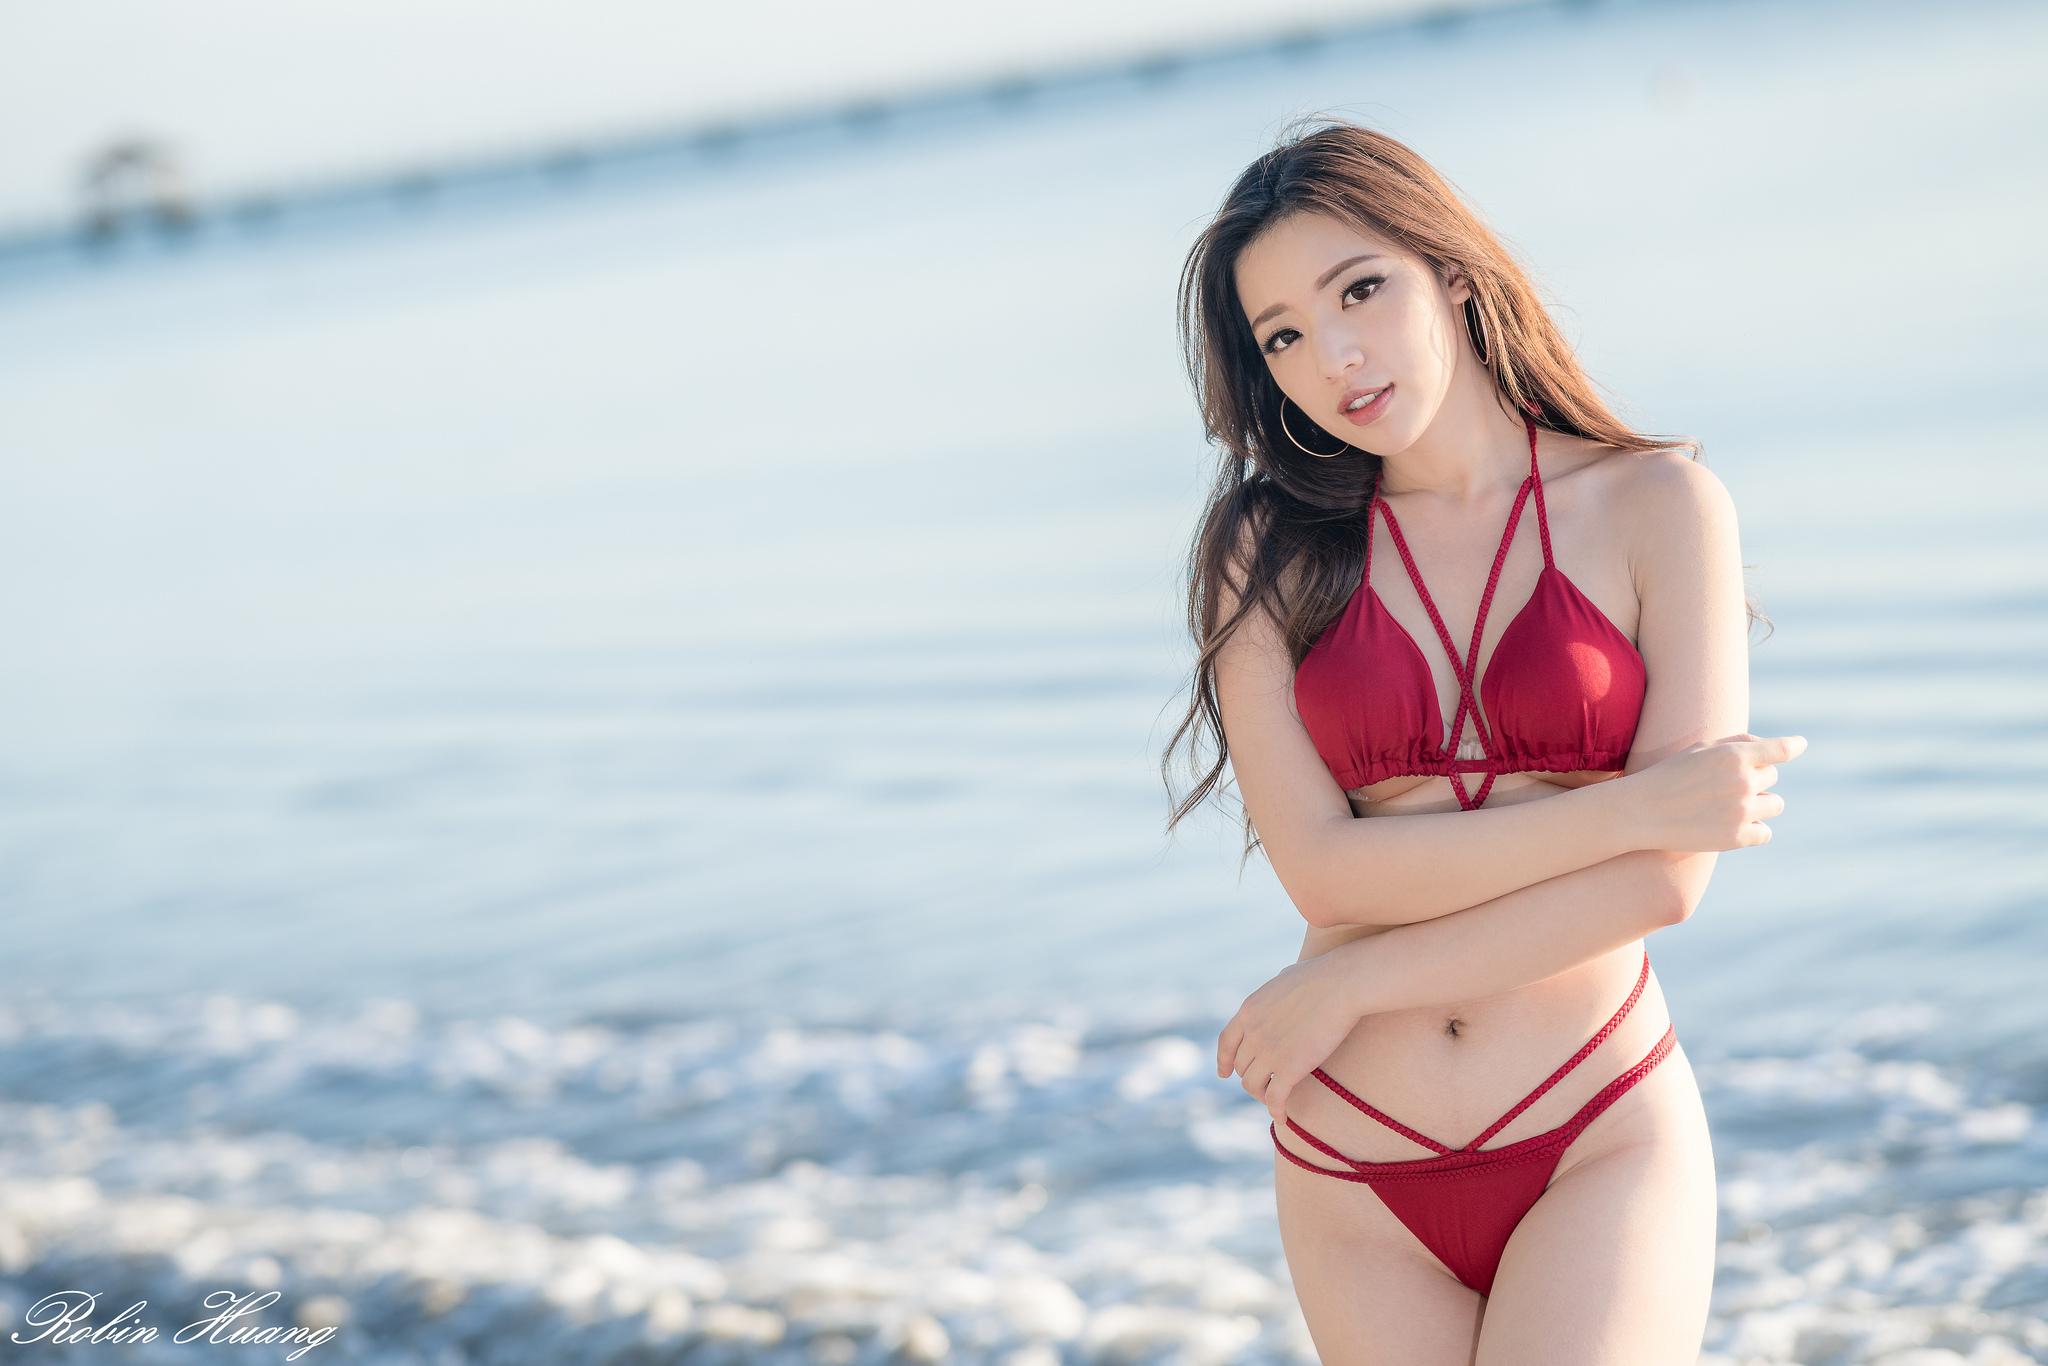 Japanese bikini girl wallpapers, hot granny sex video